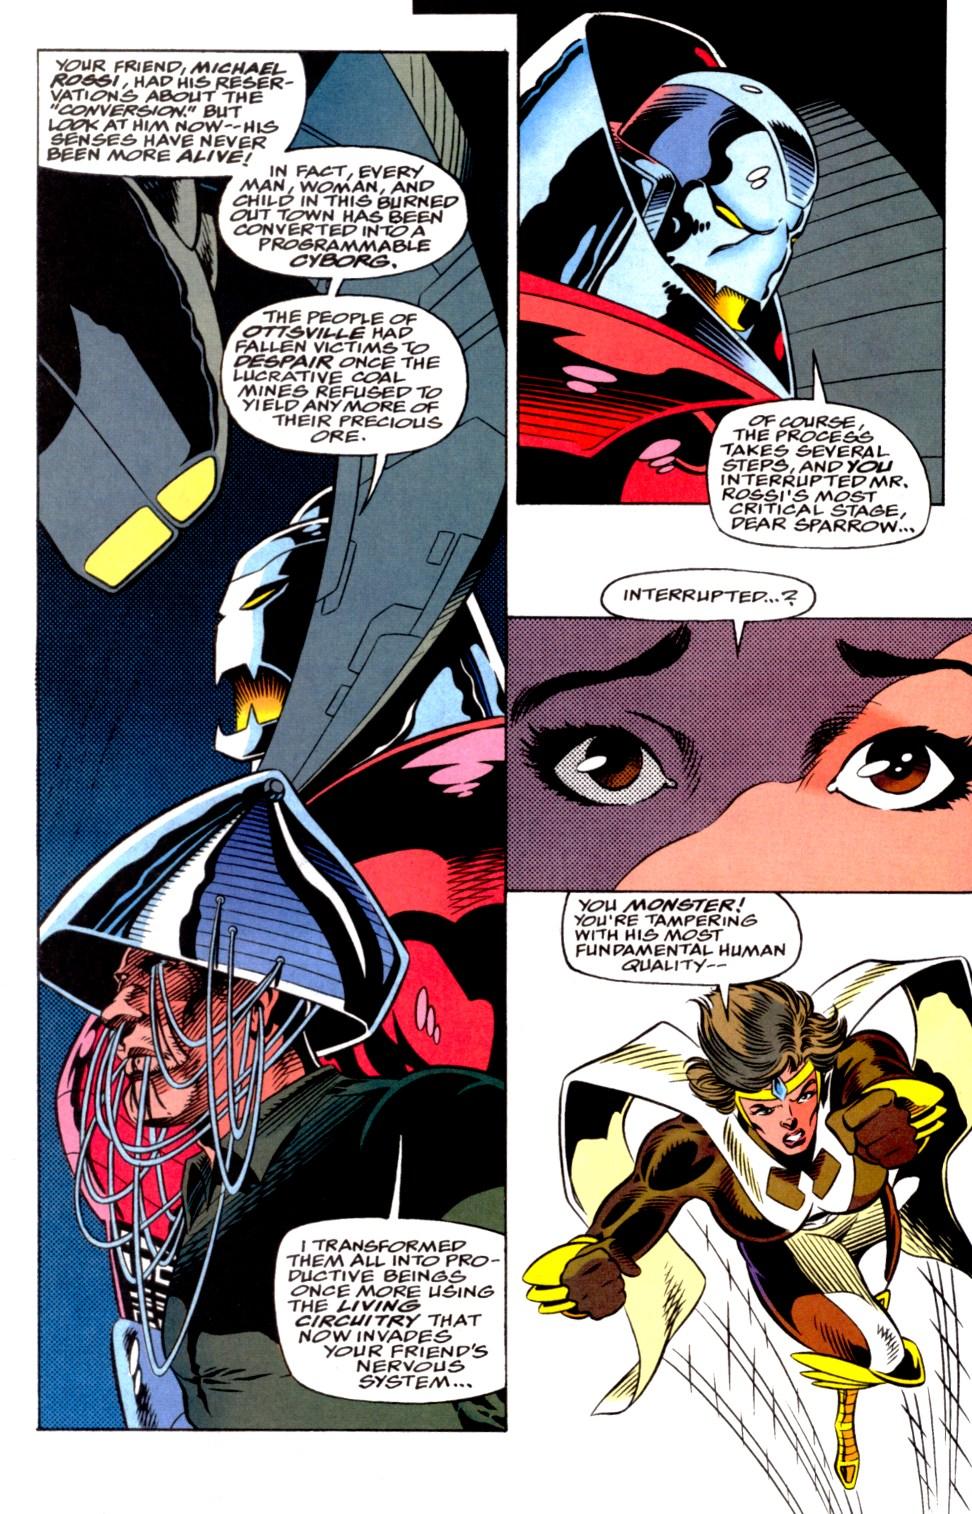 Read online Blackwulf comic -  Issue #4 - 18